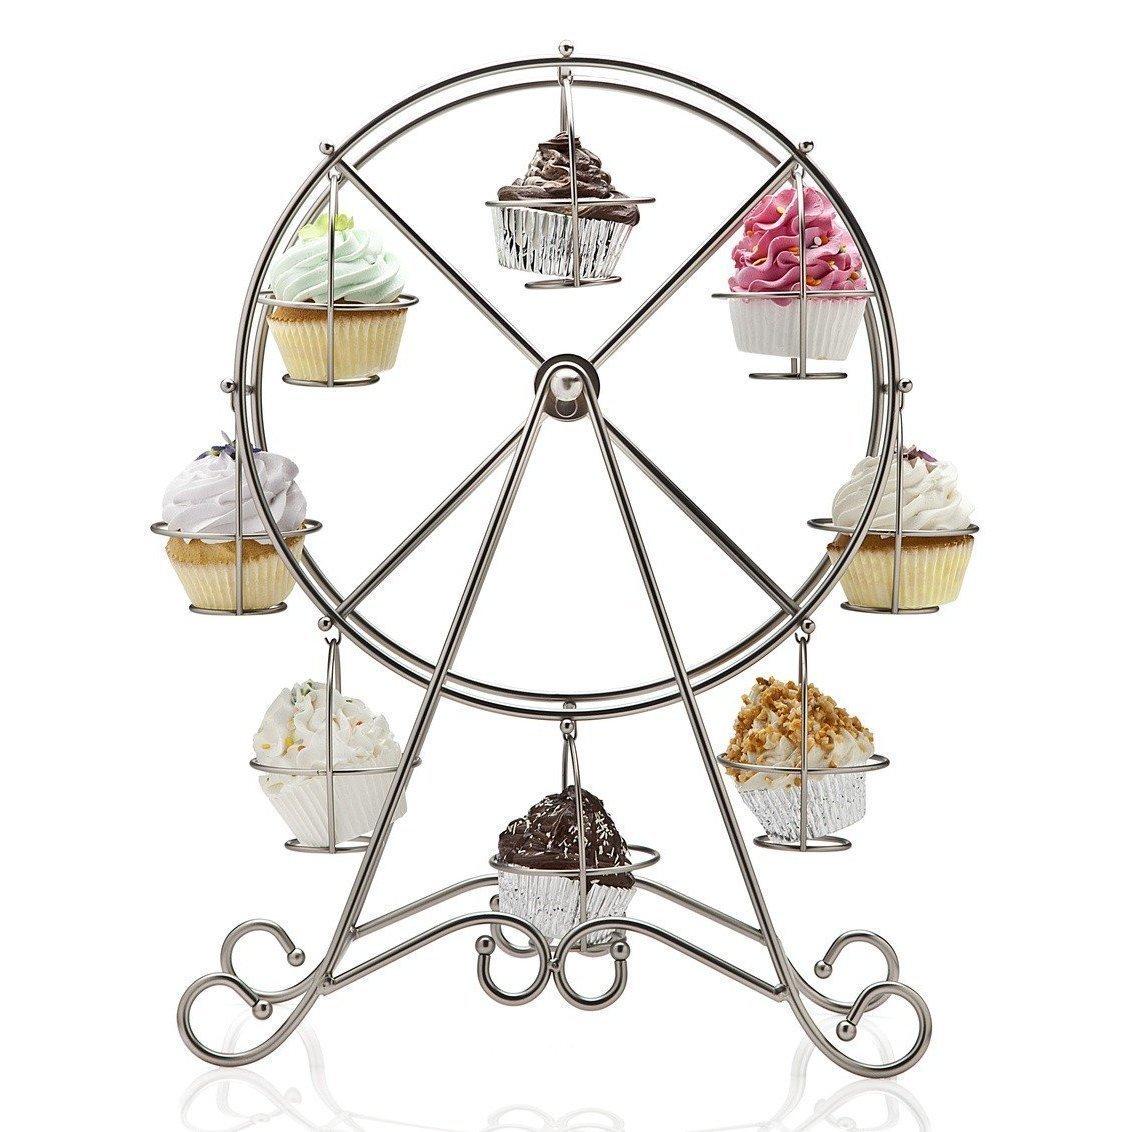 Amazon Home X Rotating Ferris Wheel Cupcake And Dessert Server